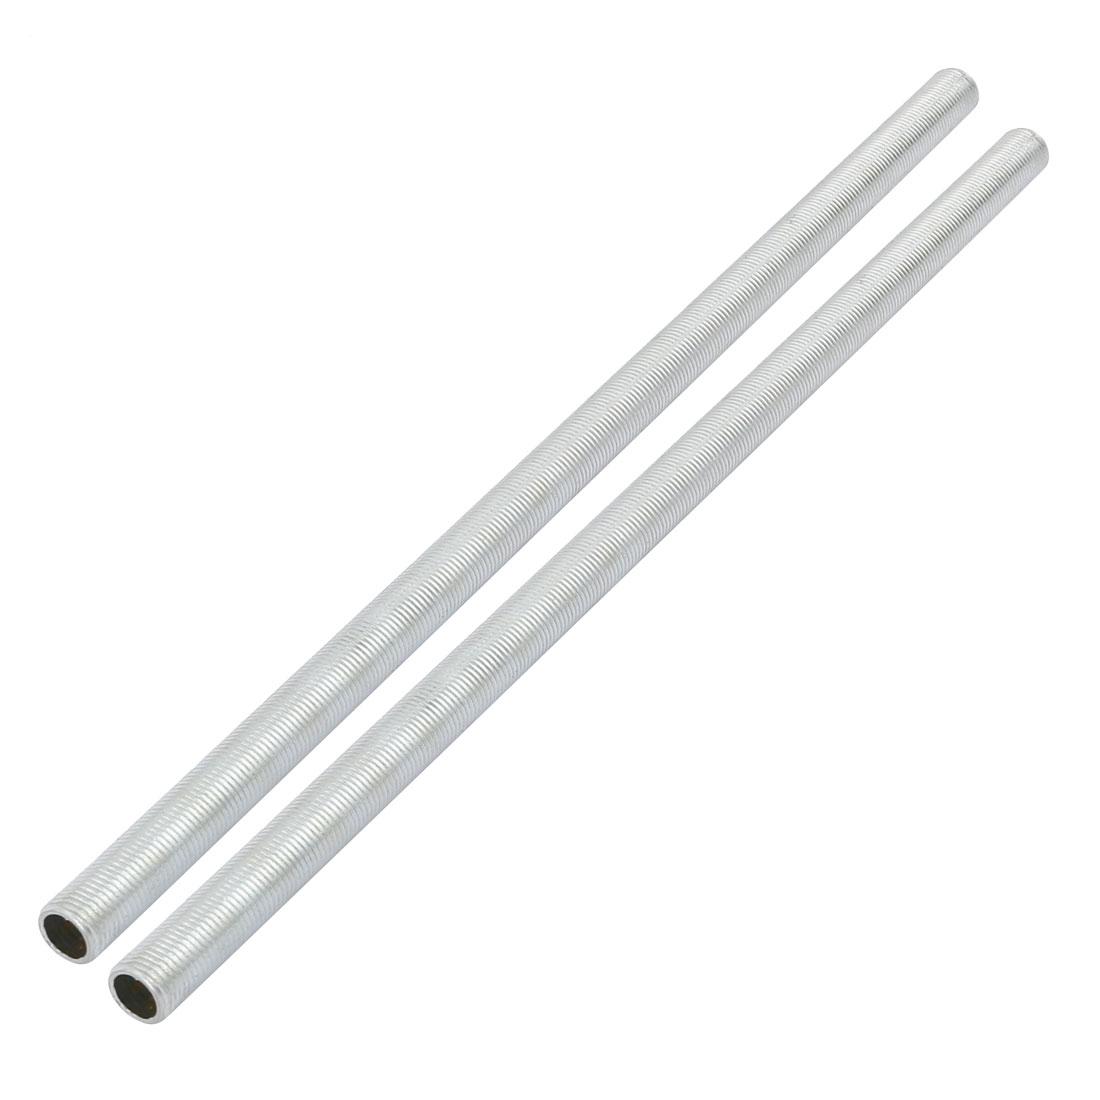 Metric M10 1mm Pitch Thread Zinc Plated Pipe Nipple Lamp Parts 260mm Long 2pcs